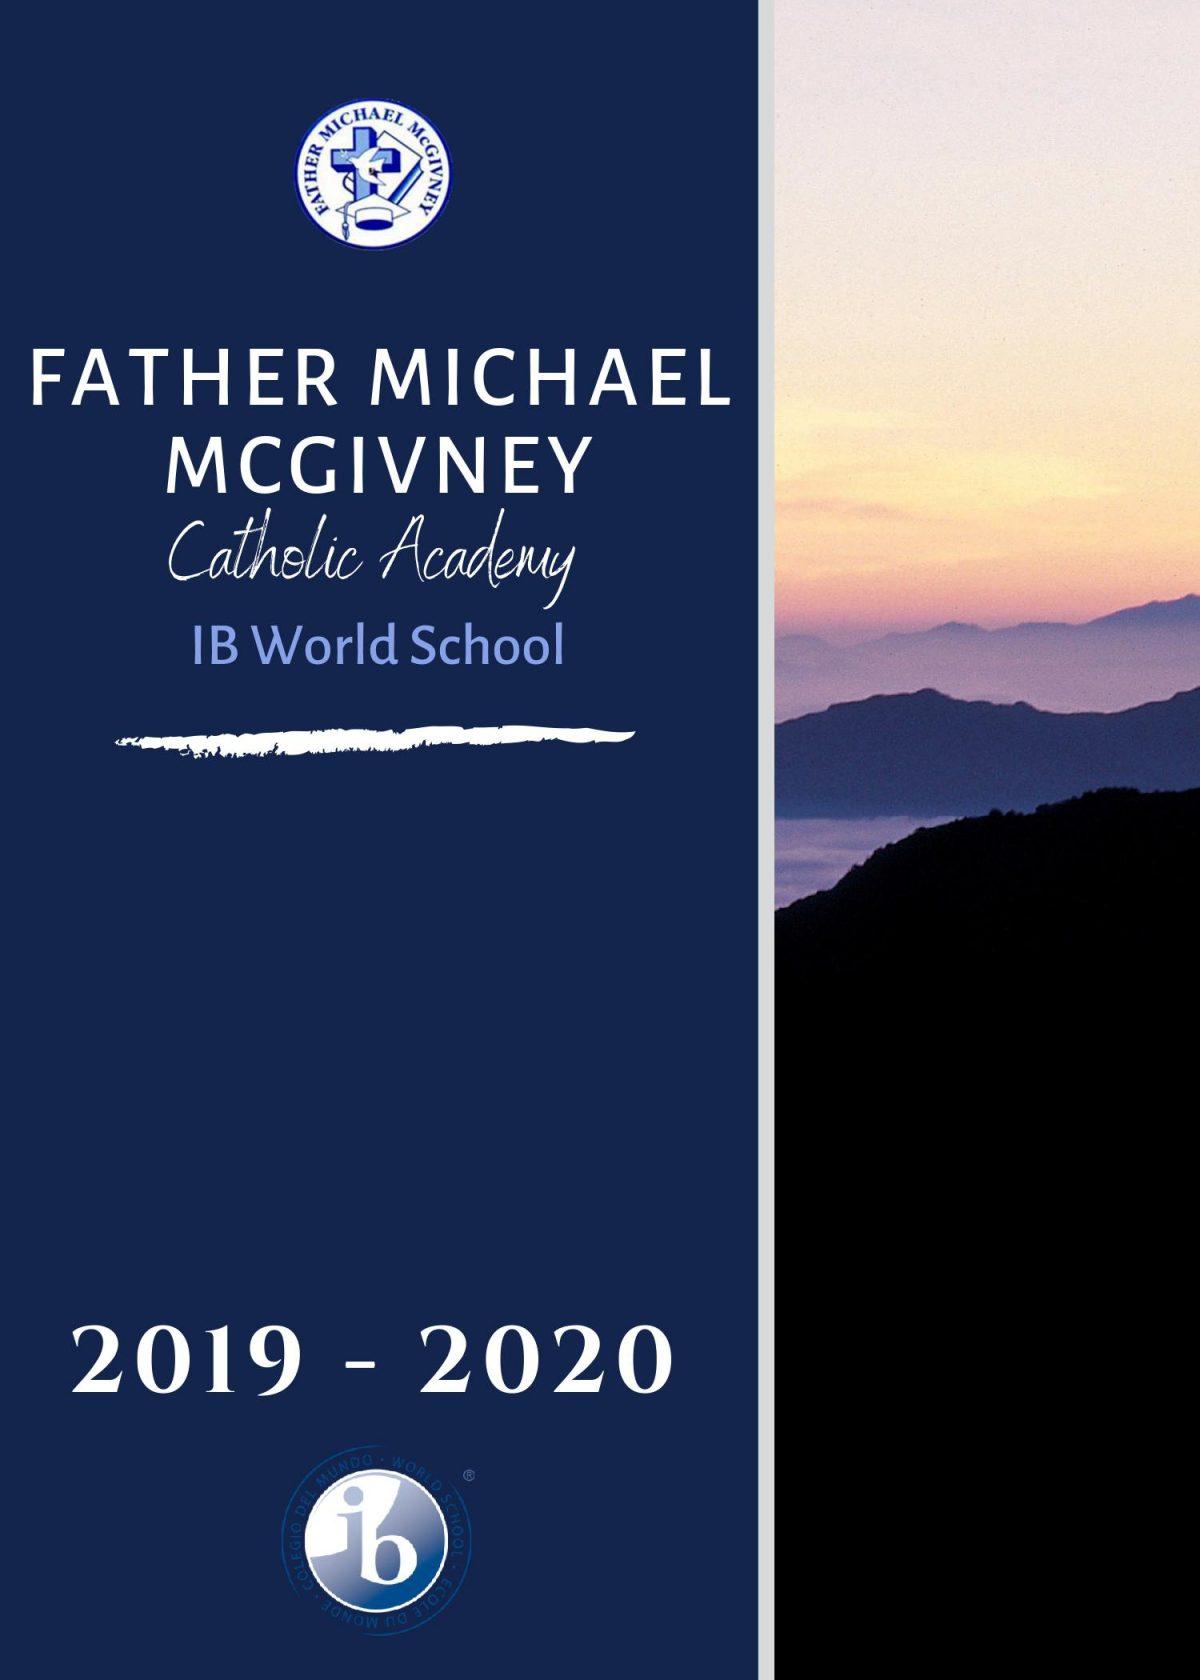 Father Michael McGivney Catholic Academy – IB World School